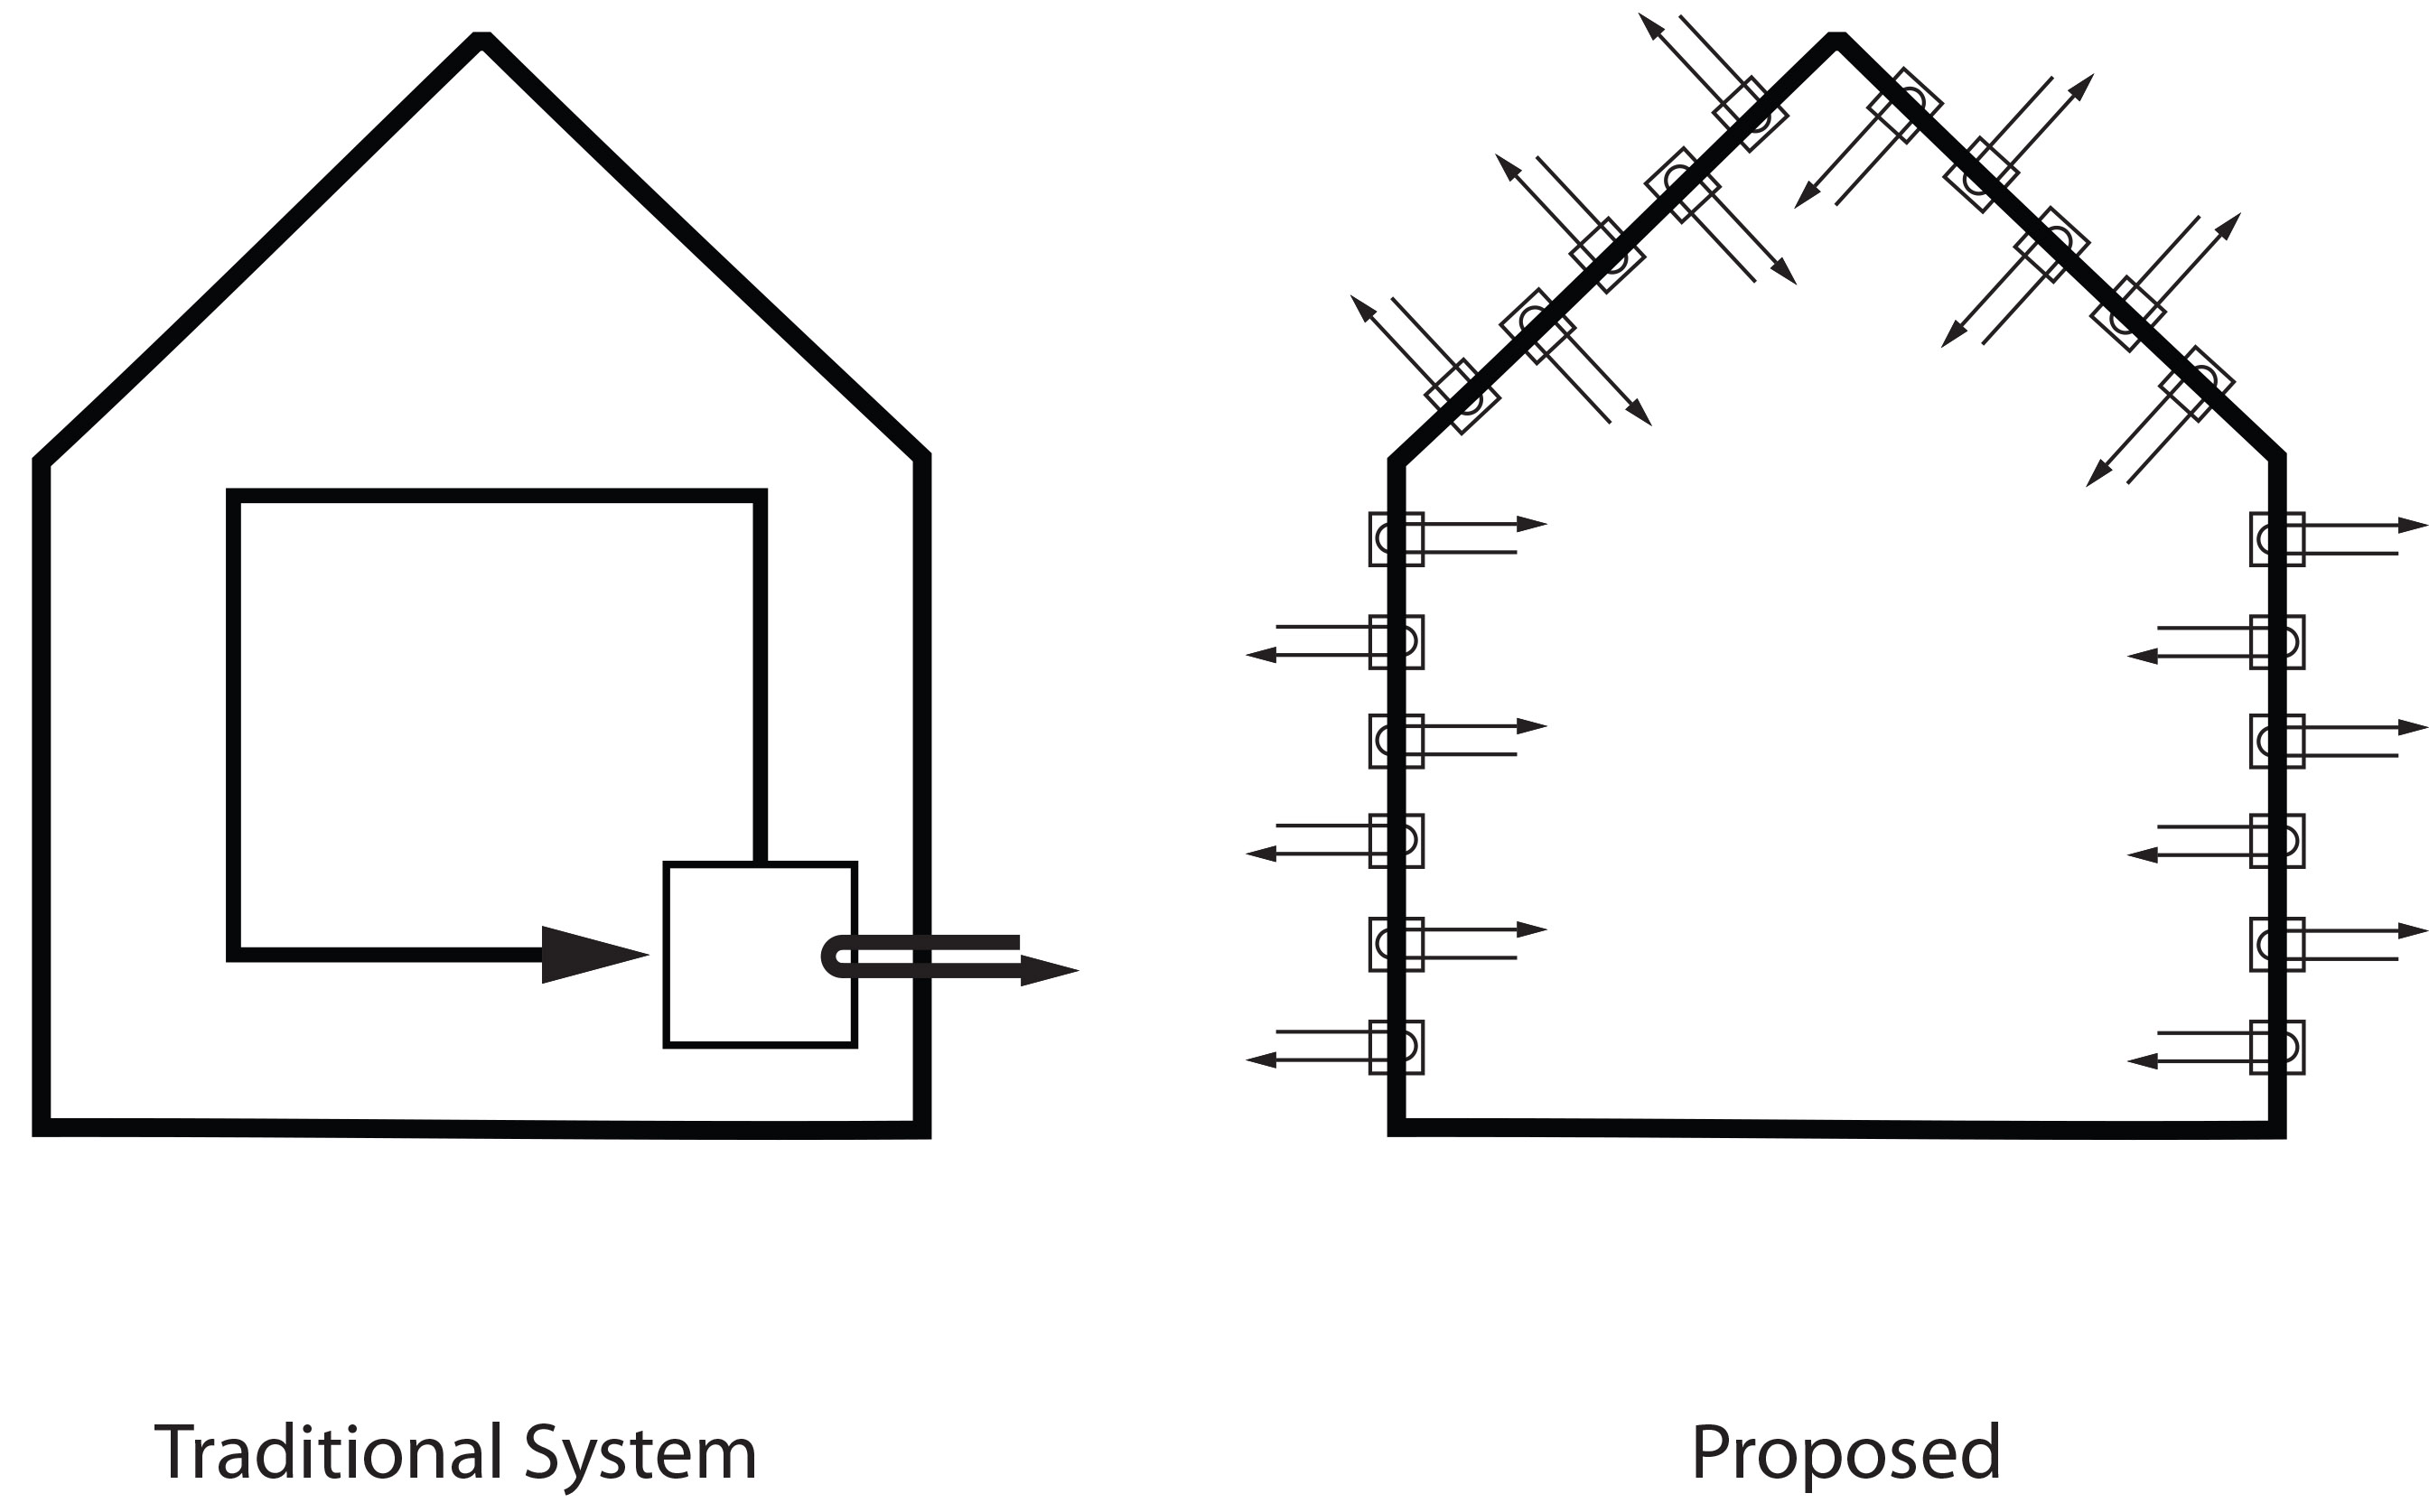 Studio N 1 Architects Responsive Architecture